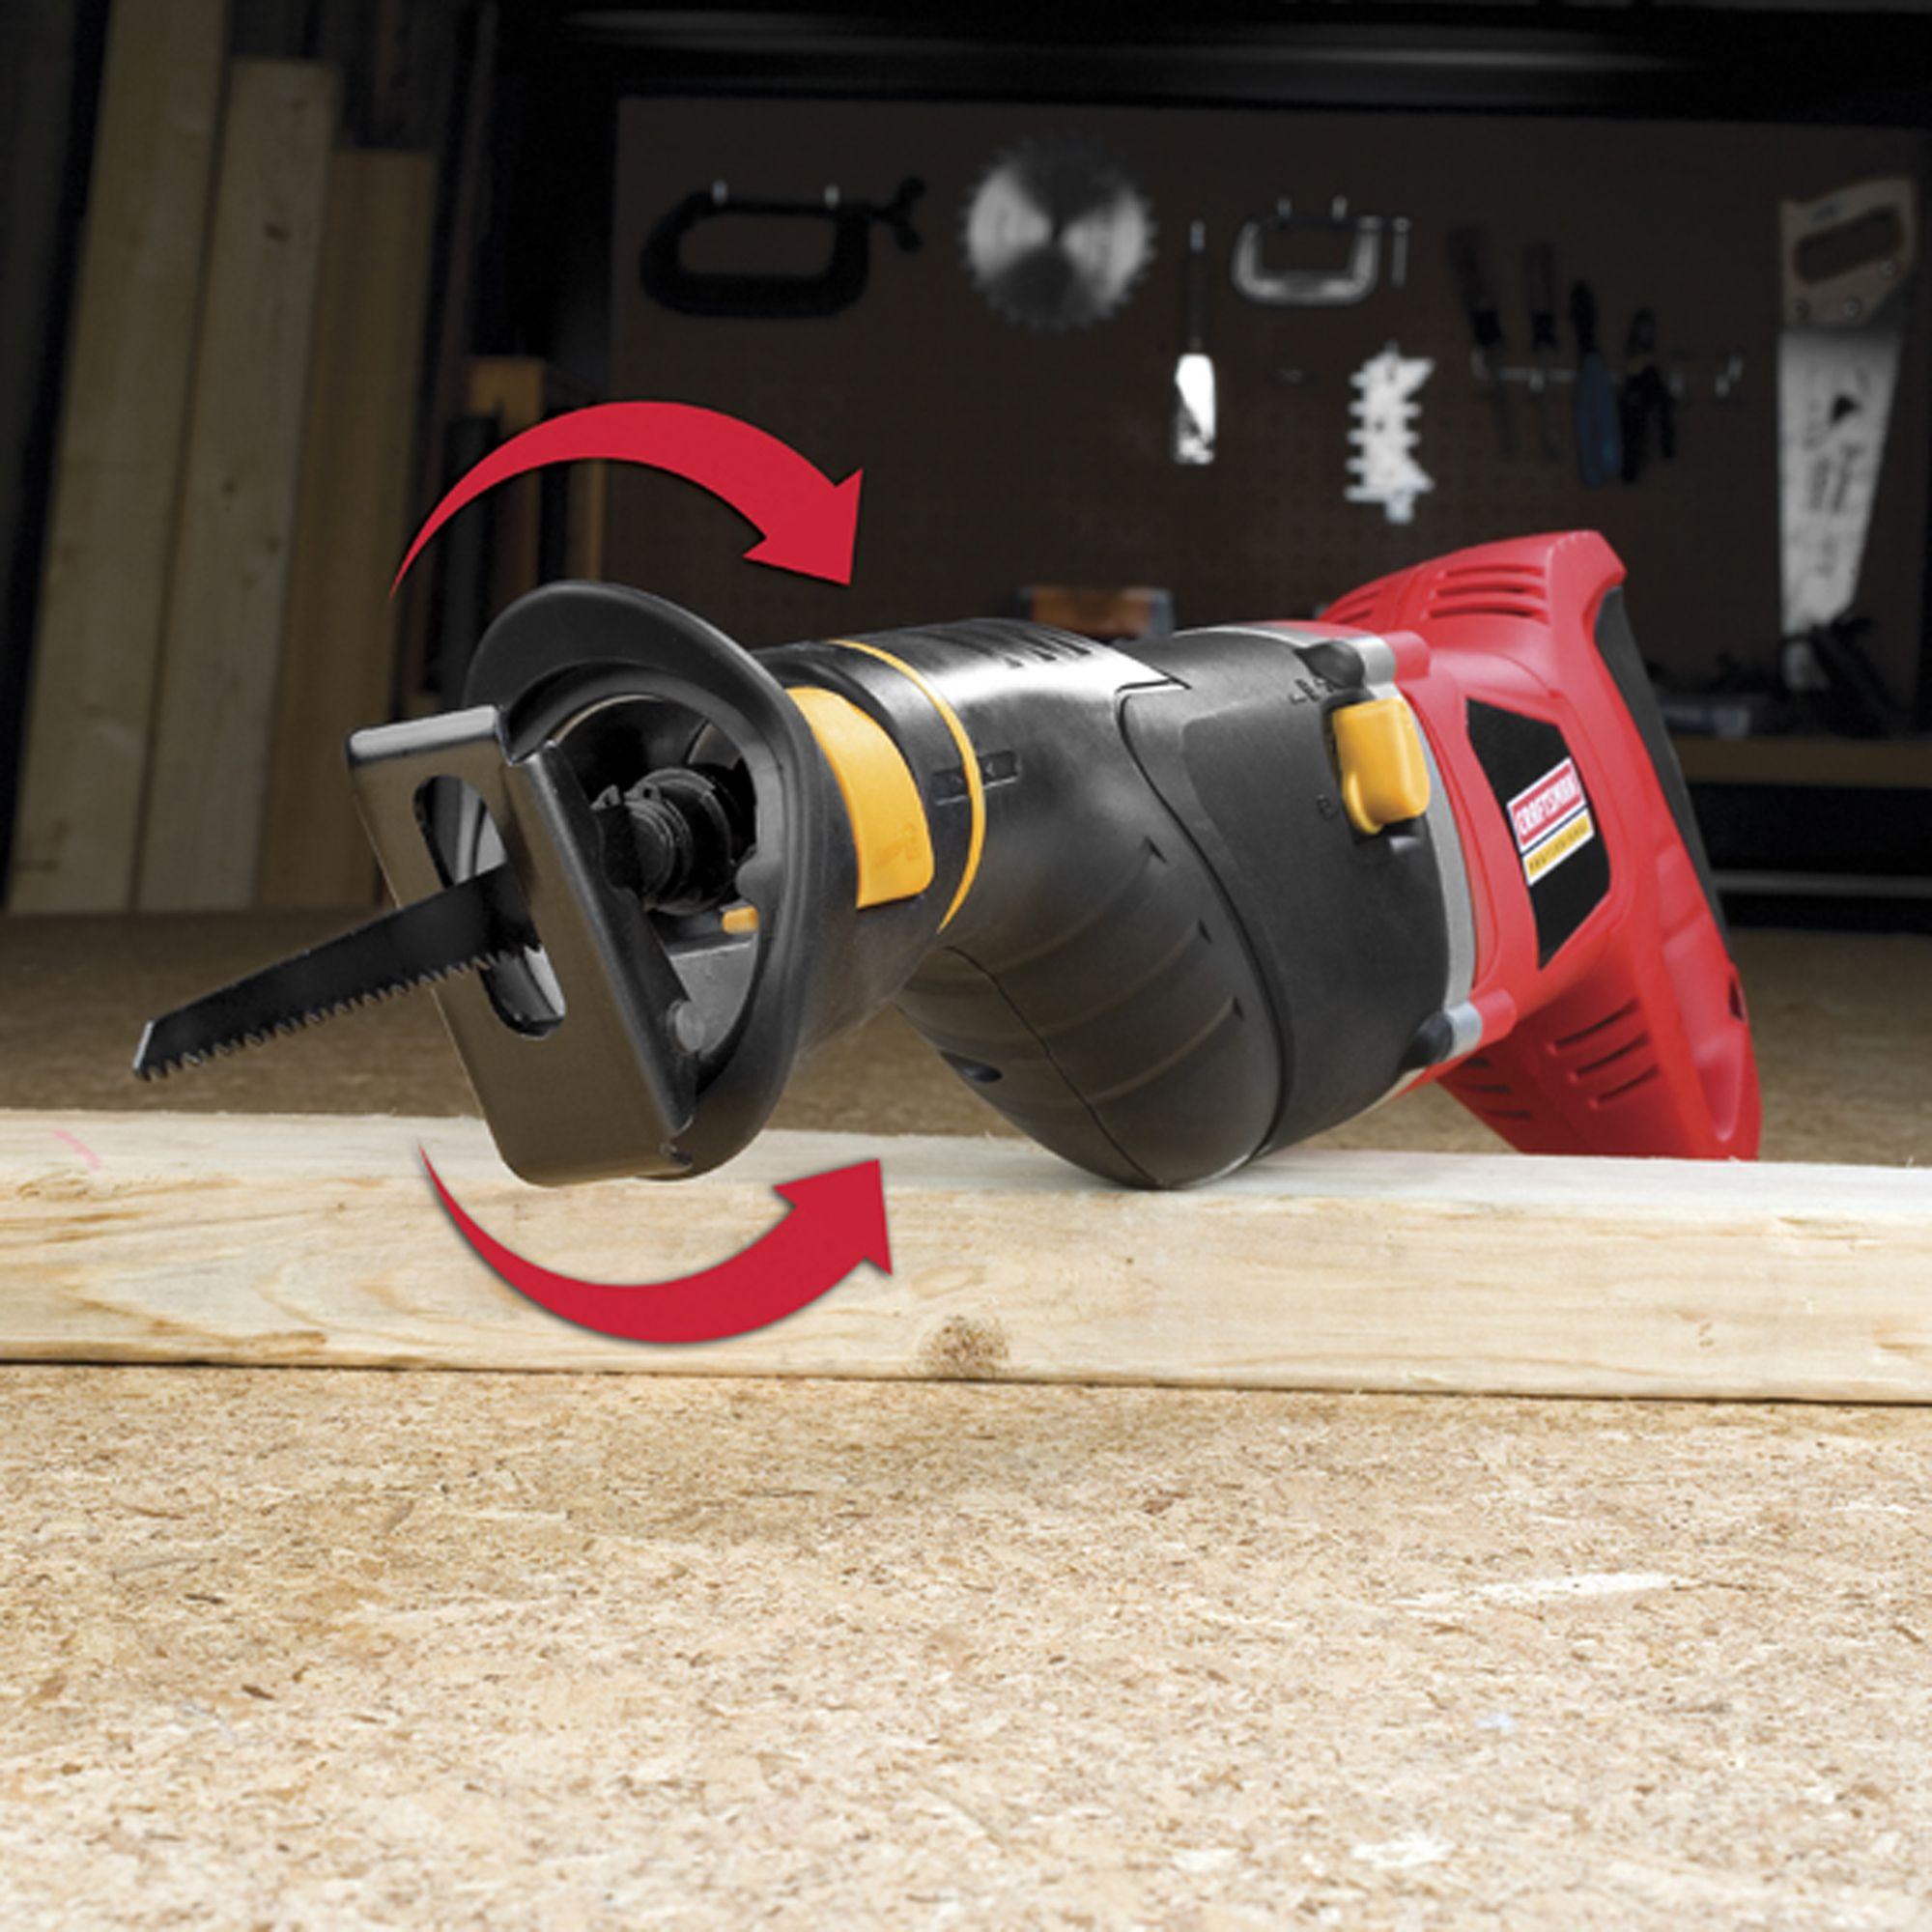 Craftsman Professional 27224 12 amp Corded Reciprocating Saw